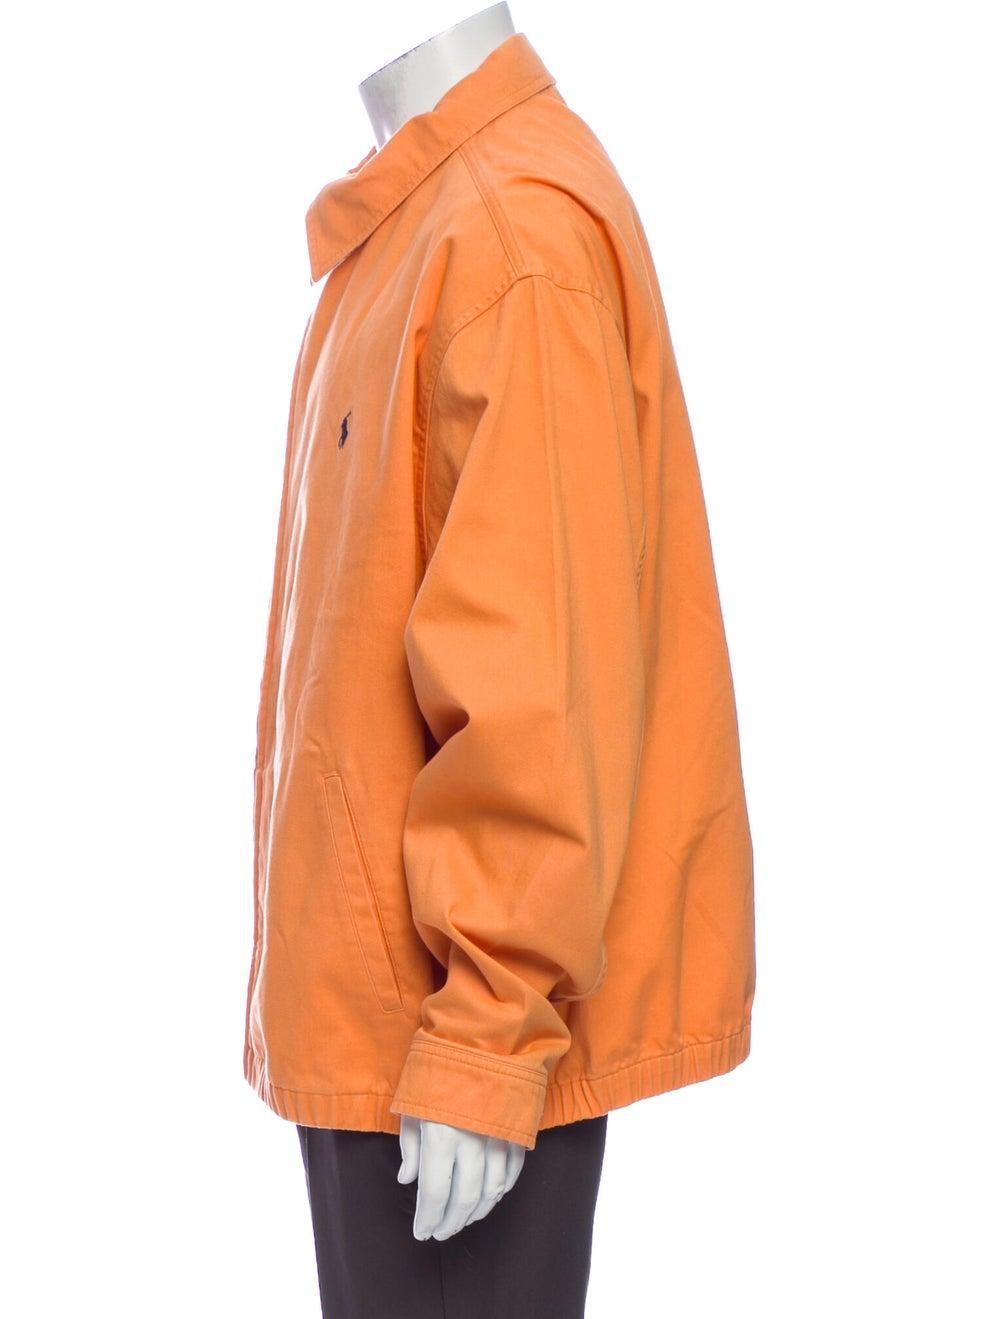 Polo Ralph Lauren Jacket Orange - image 2